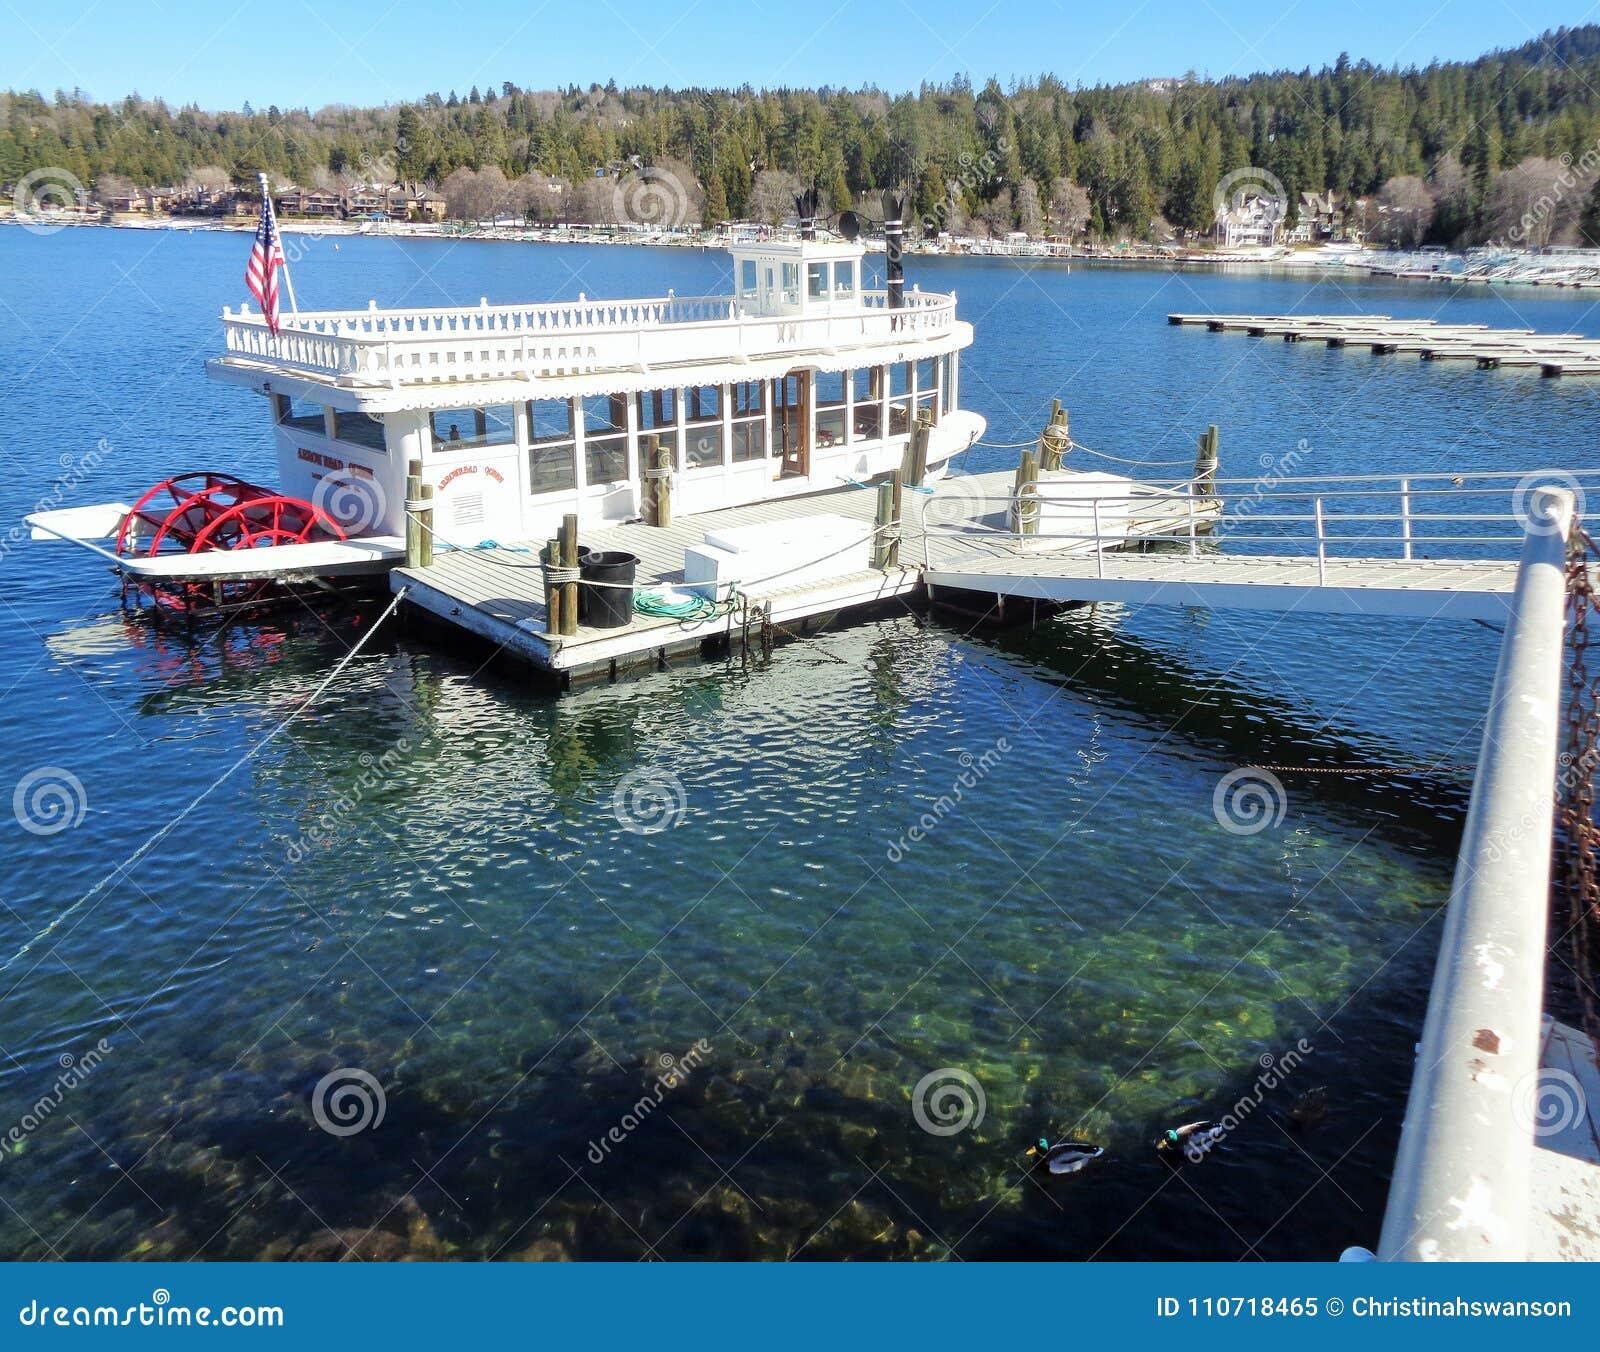 Meerpijlpunt Koningin Paddle-wheel Boat Waiting Dock